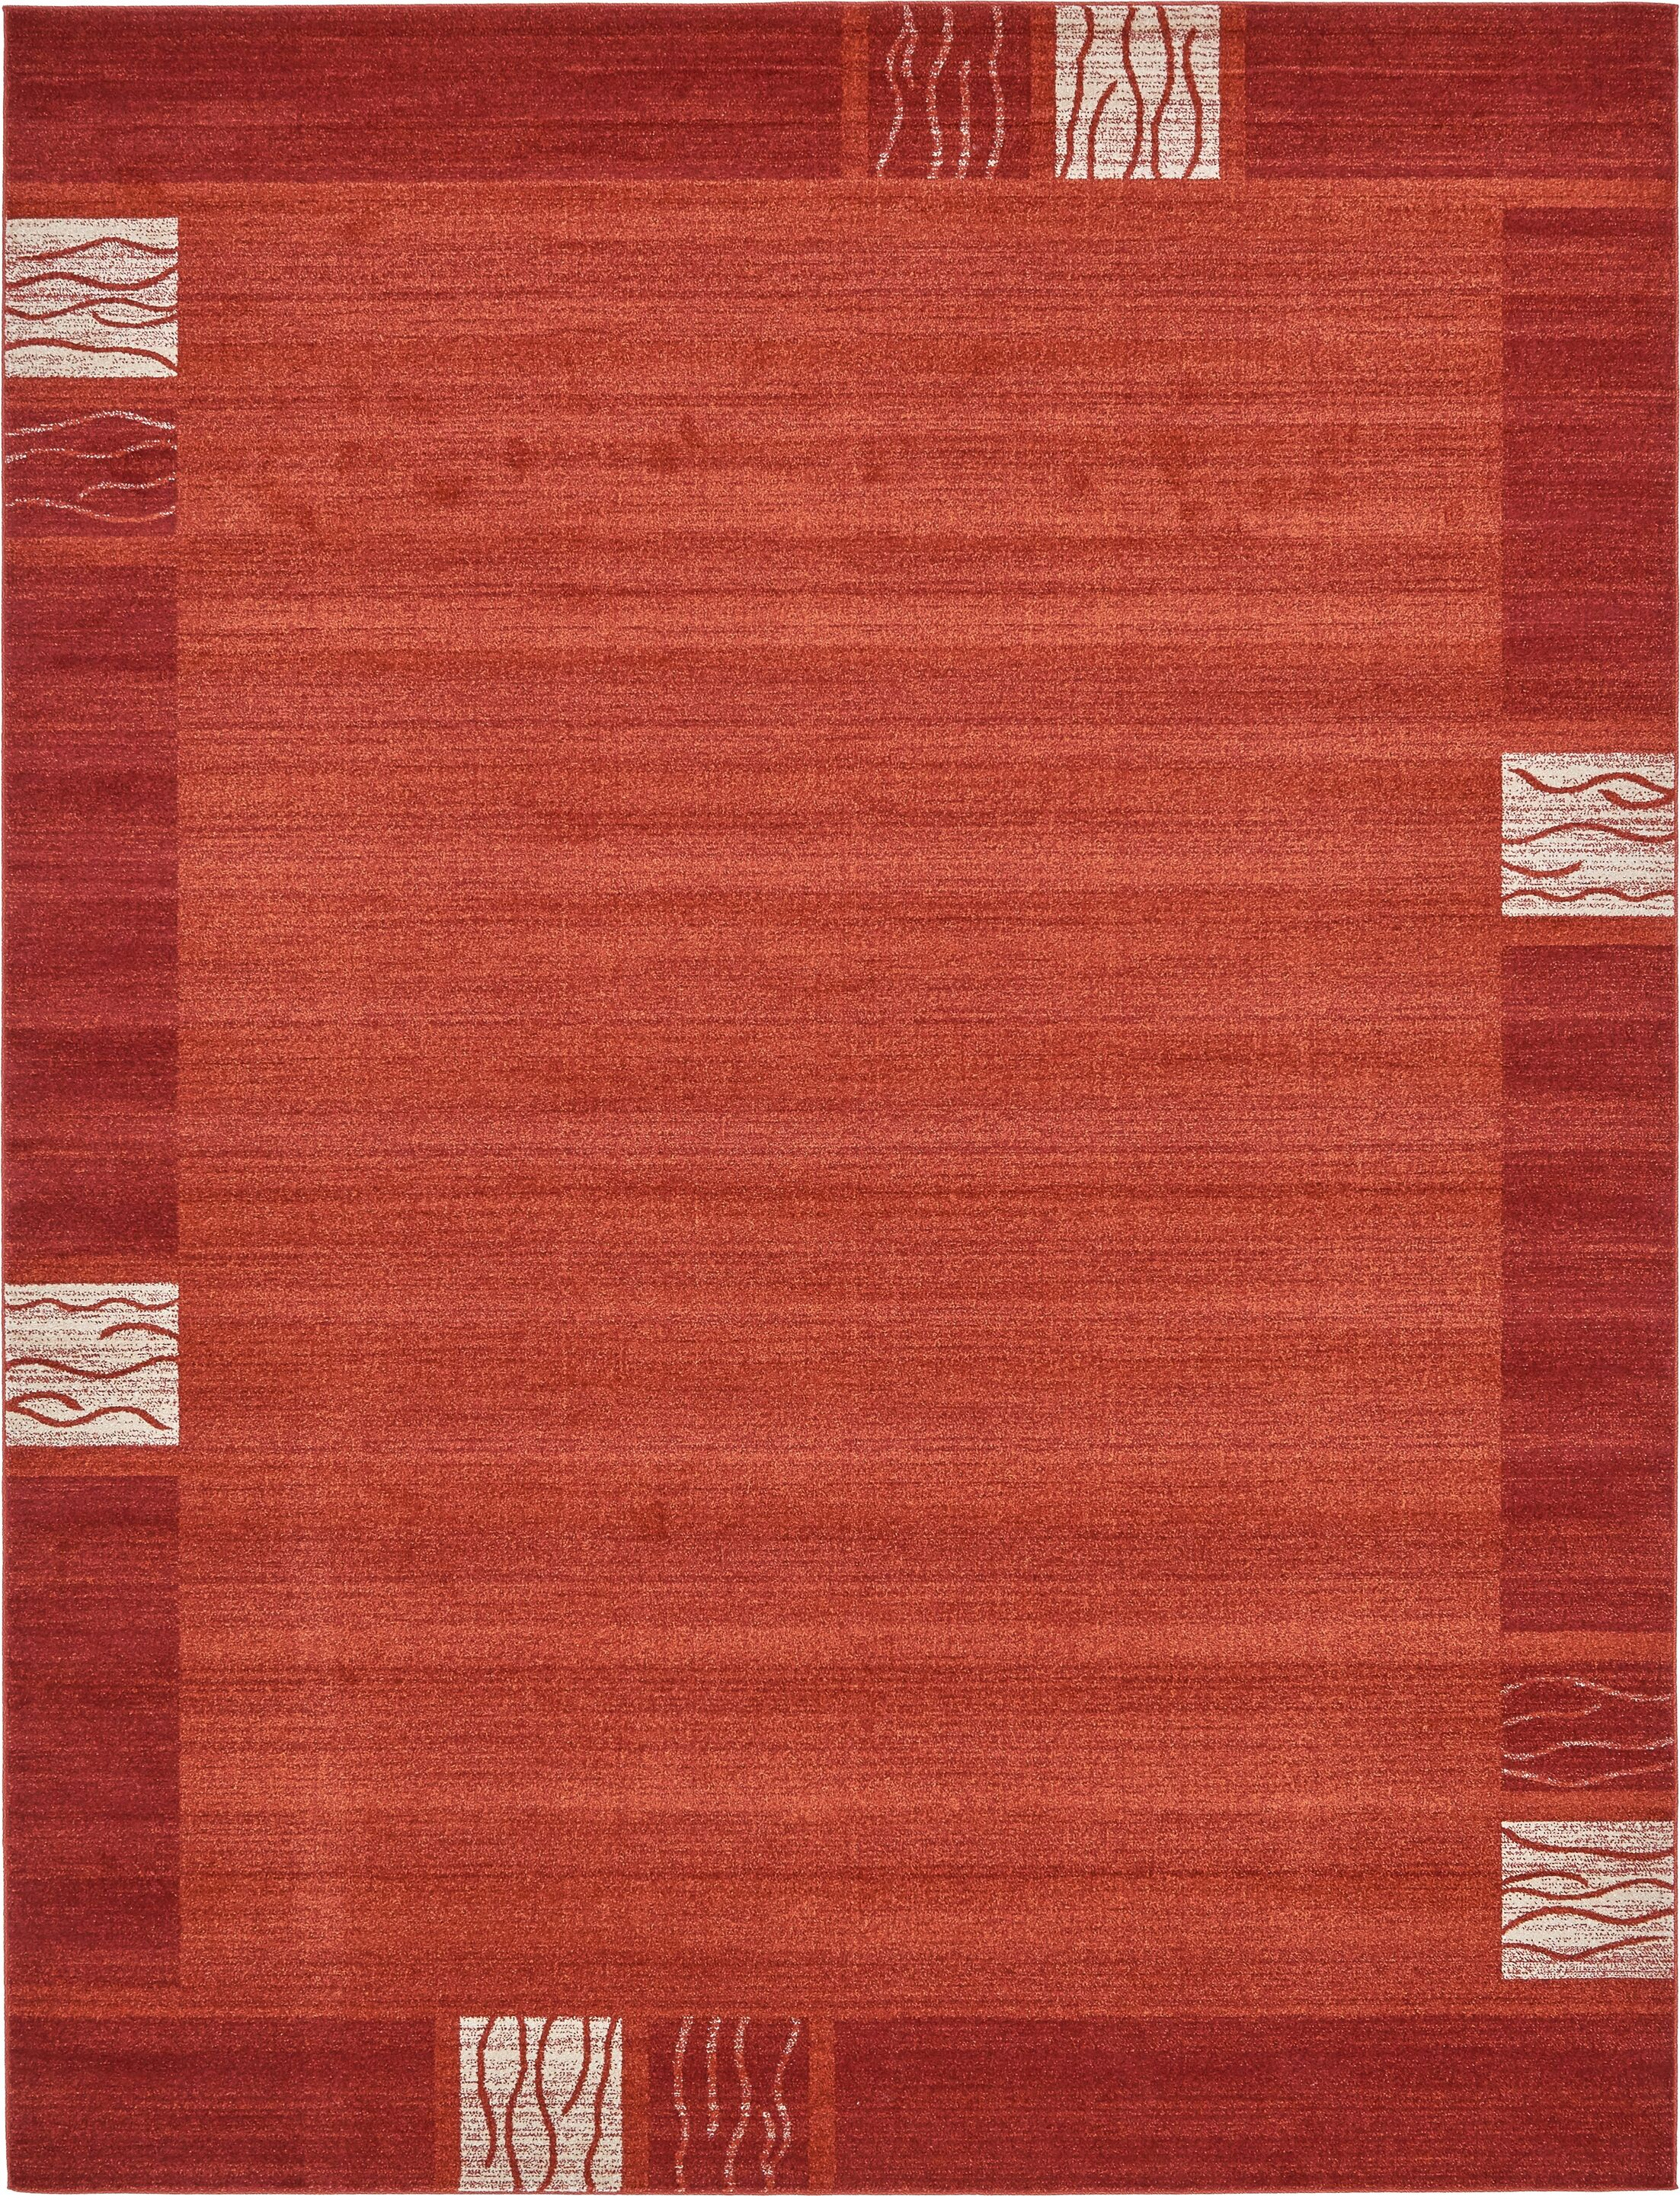 Christi Red Area Rug Rug Size: Rectangle 10' x 13'